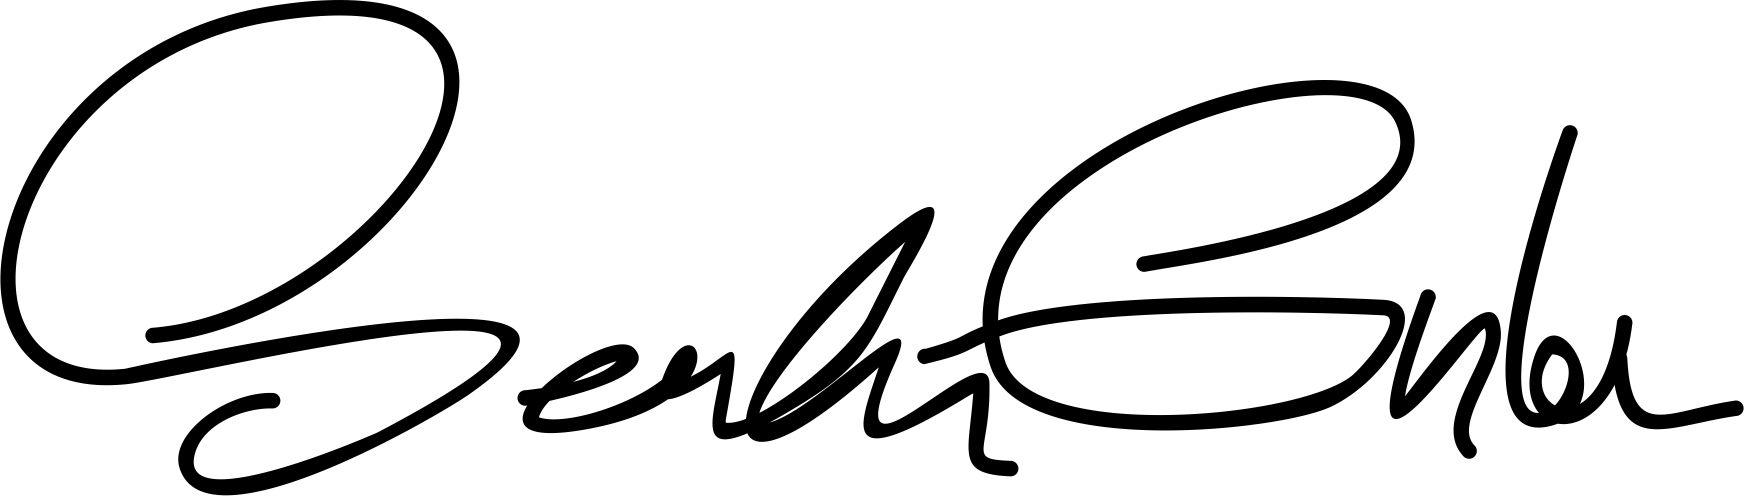 serdar gunler Signature